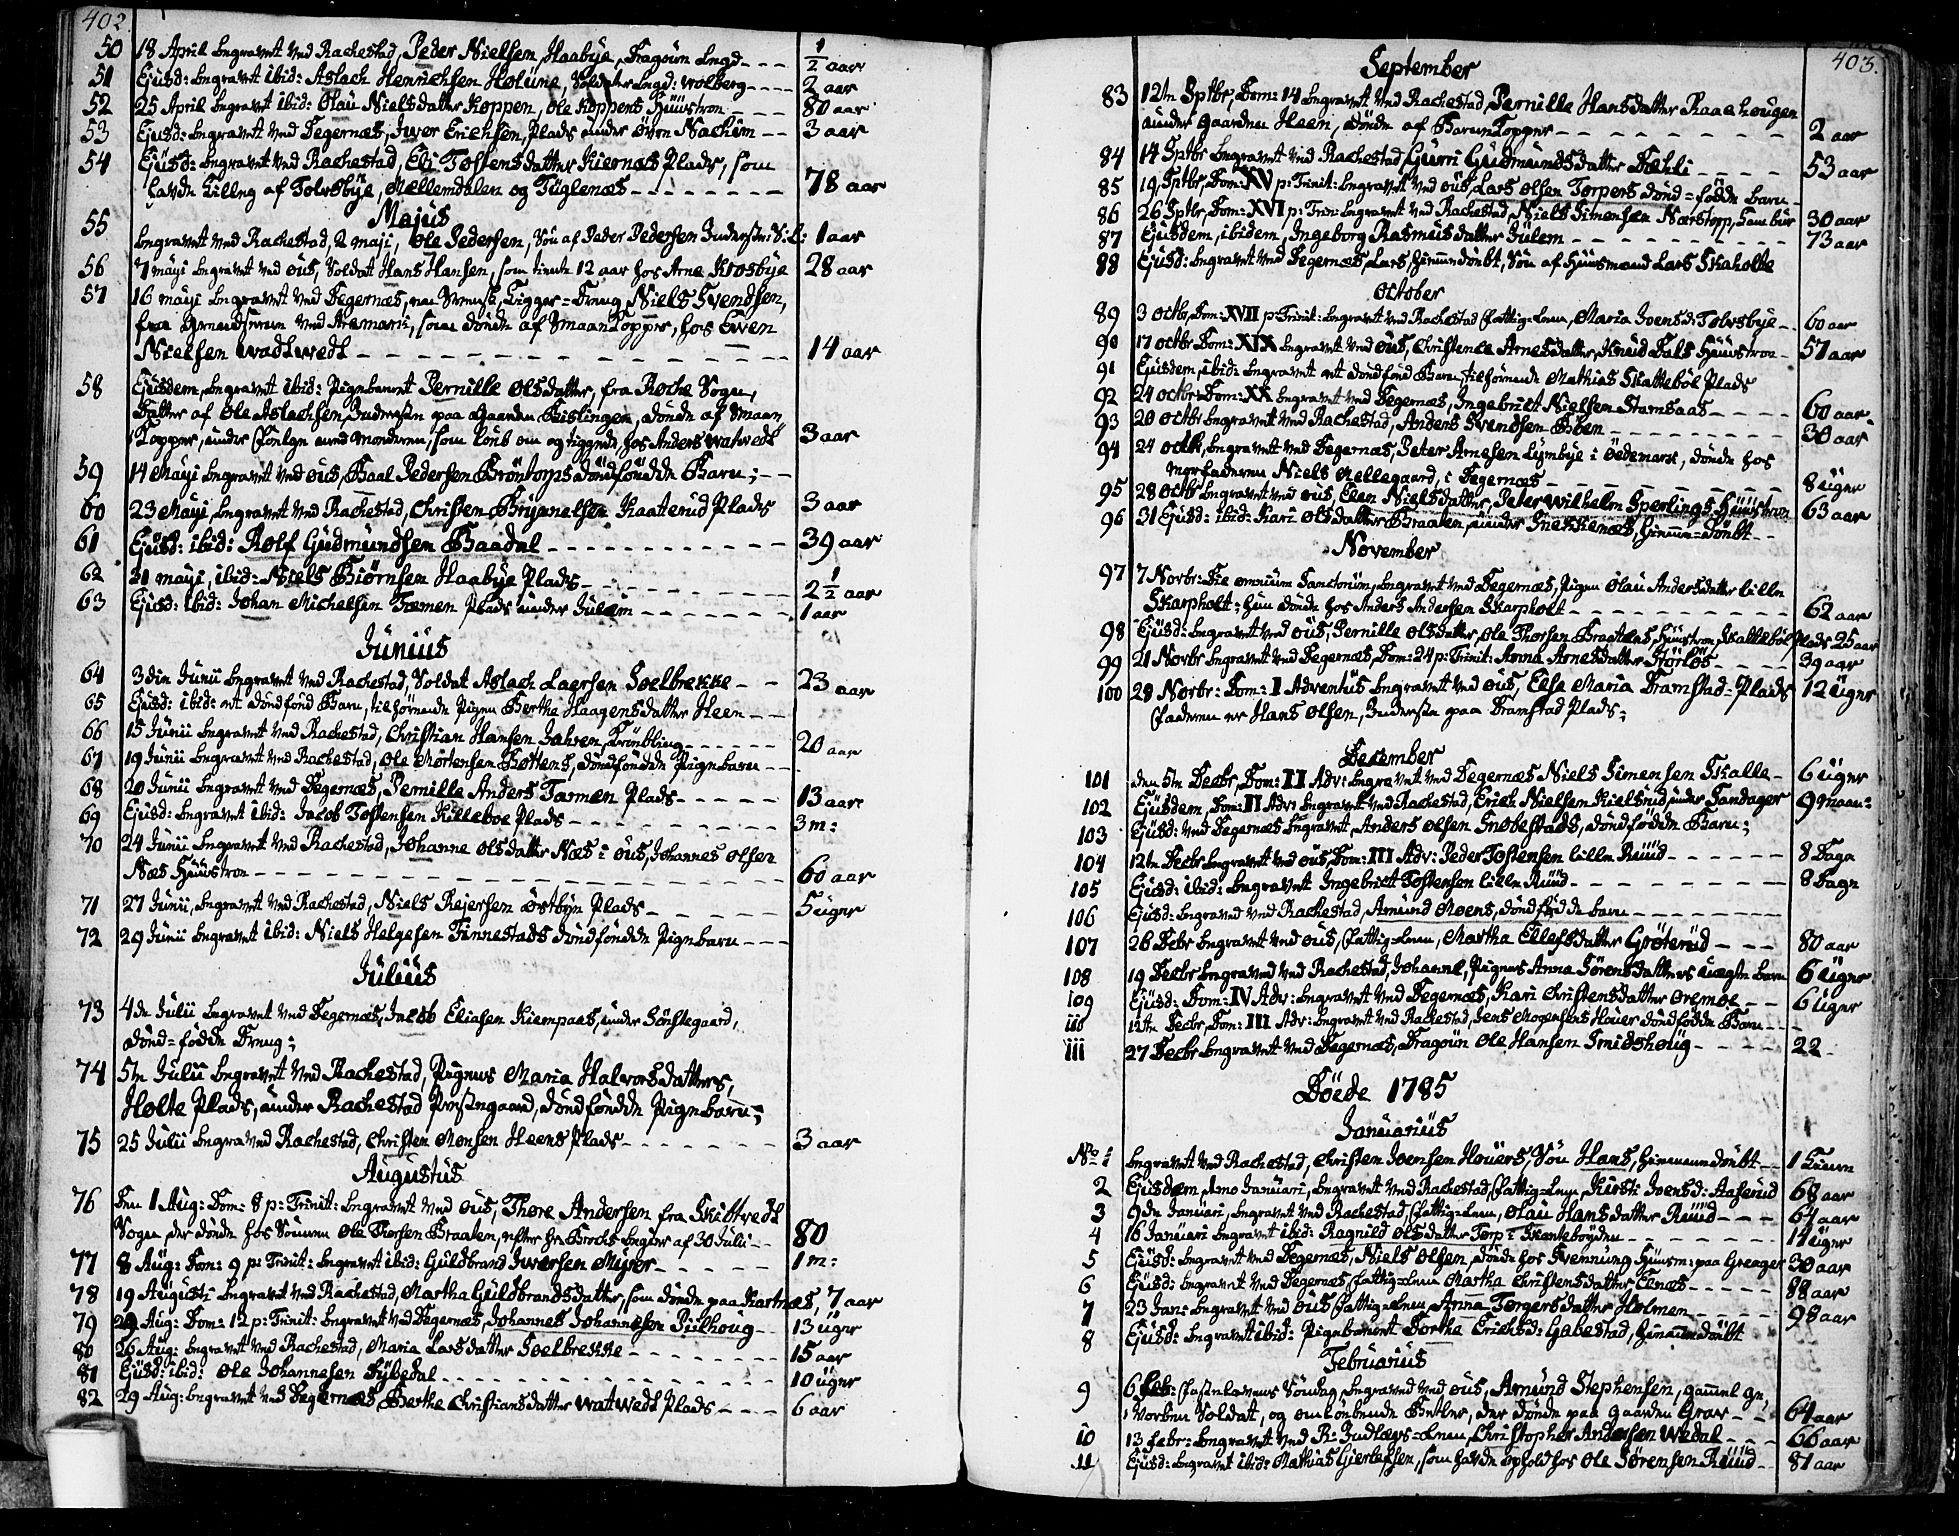 SAO, Rakkestad prestekontor Kirkebøker, F/Fa/L0005: Ministerialbok nr. I 5, 1784-1814, s. 402-403